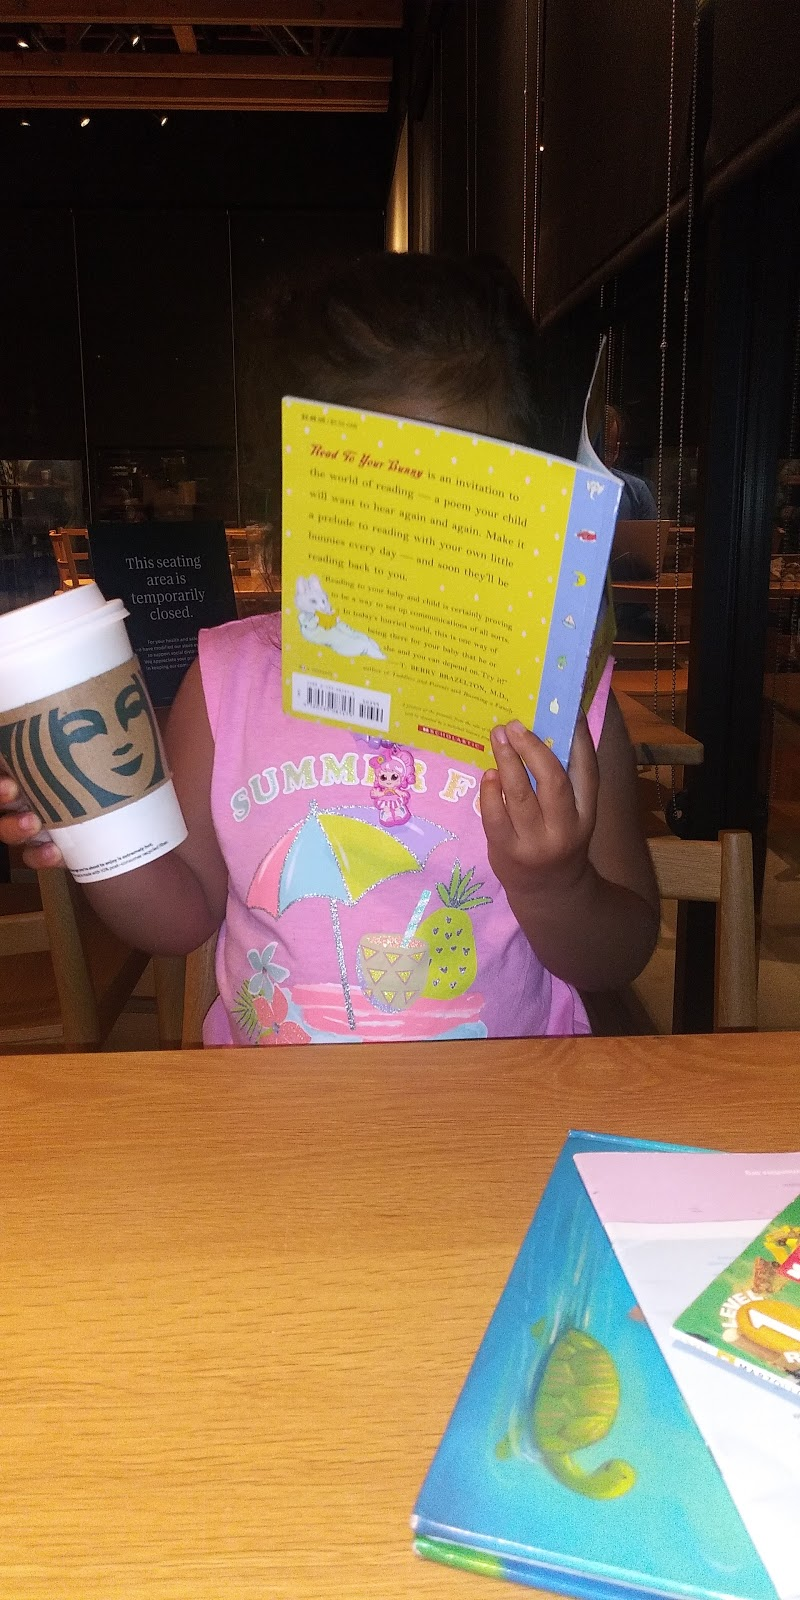 Starbucks - cafe  | Photo 5 of 5 | Address: 9900 Balboa Blvd, Northridge, CA 91325, USA | Phone: (818) 518-3844